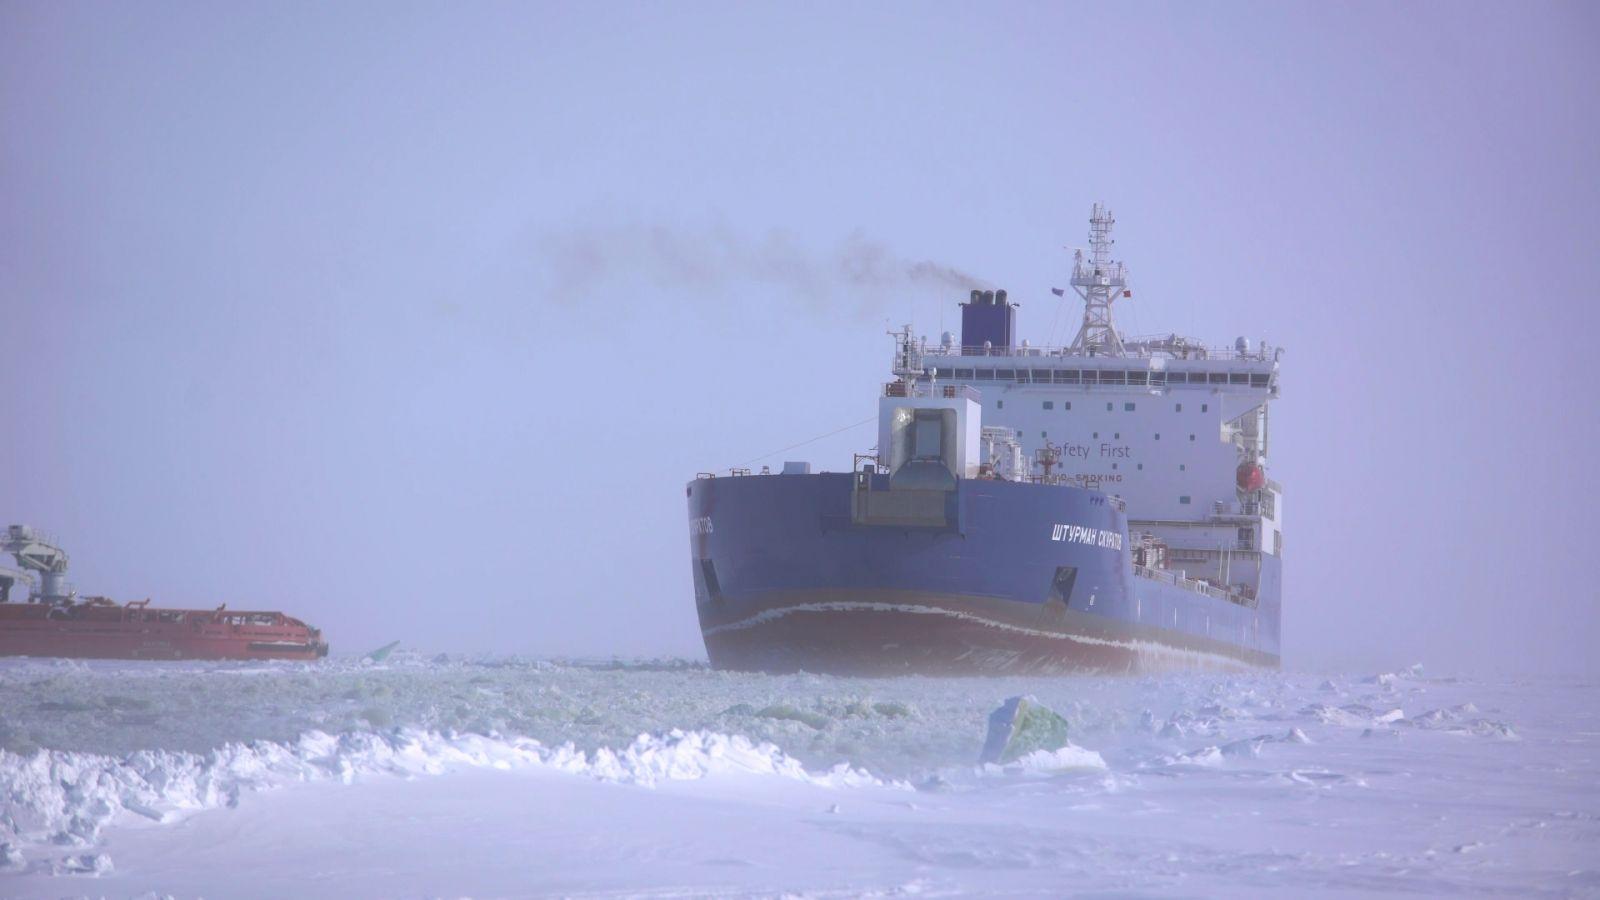 С начала года по Севморпути провезли 13 миллионов тонн грузов